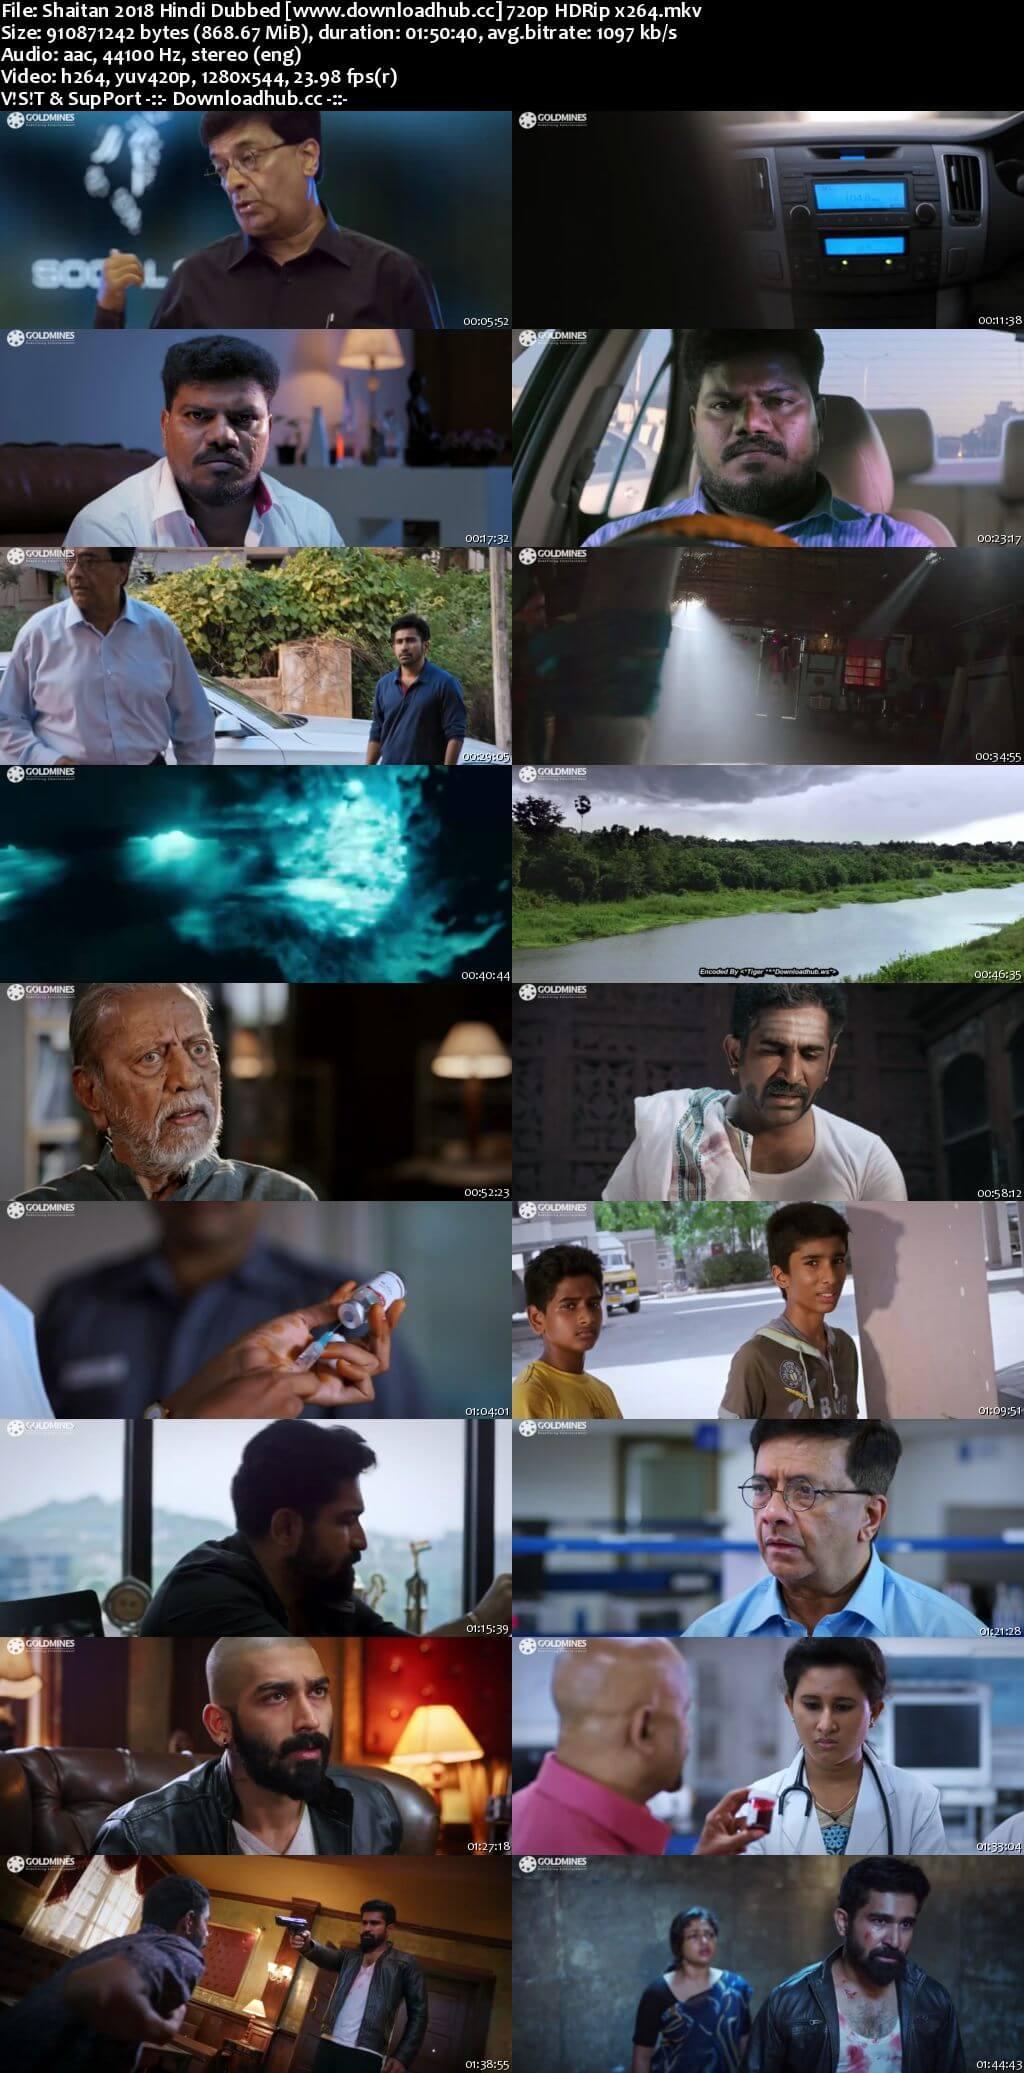 Shaitan 2018 Hindi Dubbed 720p HDRip x264